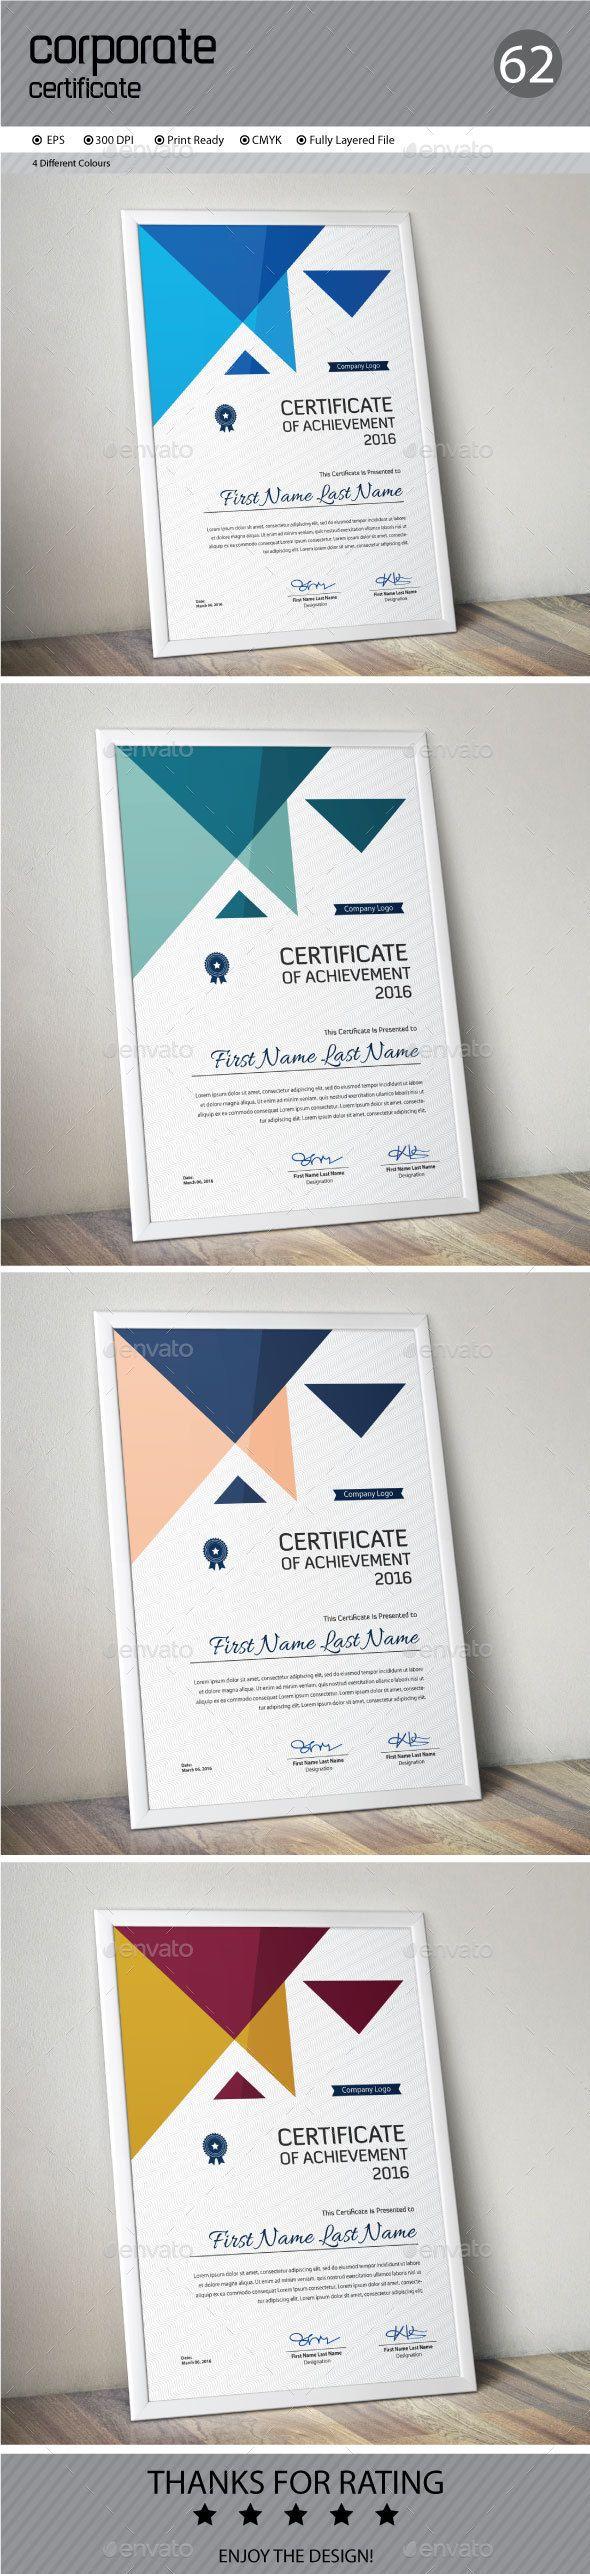 Certificate Template Vector EPS. Download here: http://graphicriver.net/item/certificate/15223920?ref=ksioks